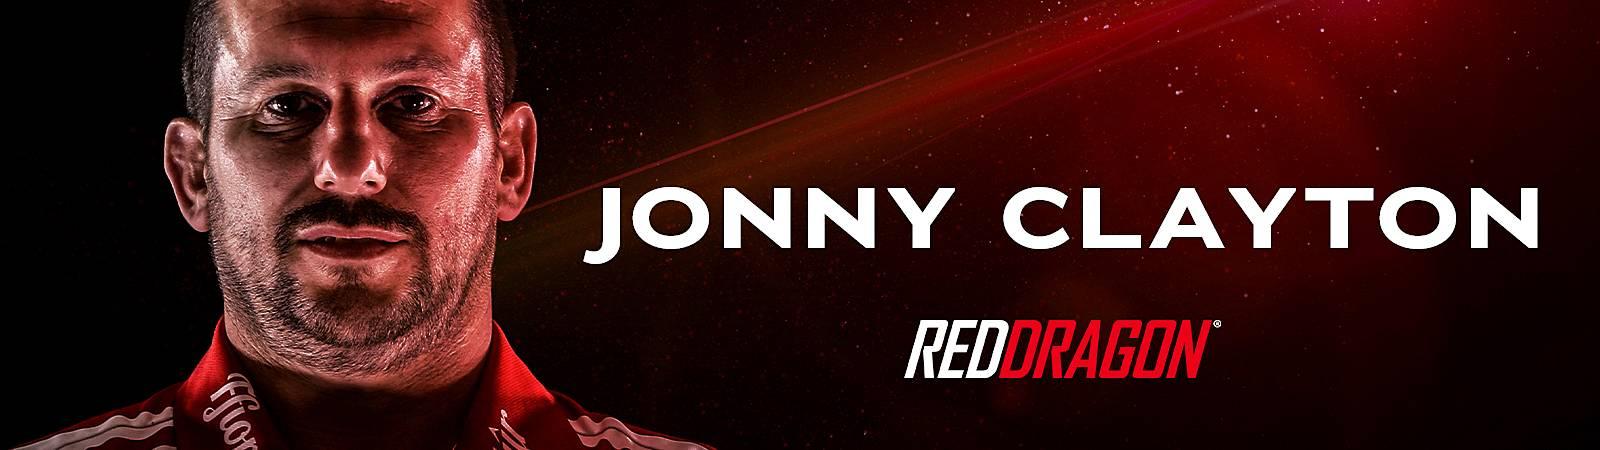 Red Dragon Jonny Clayton